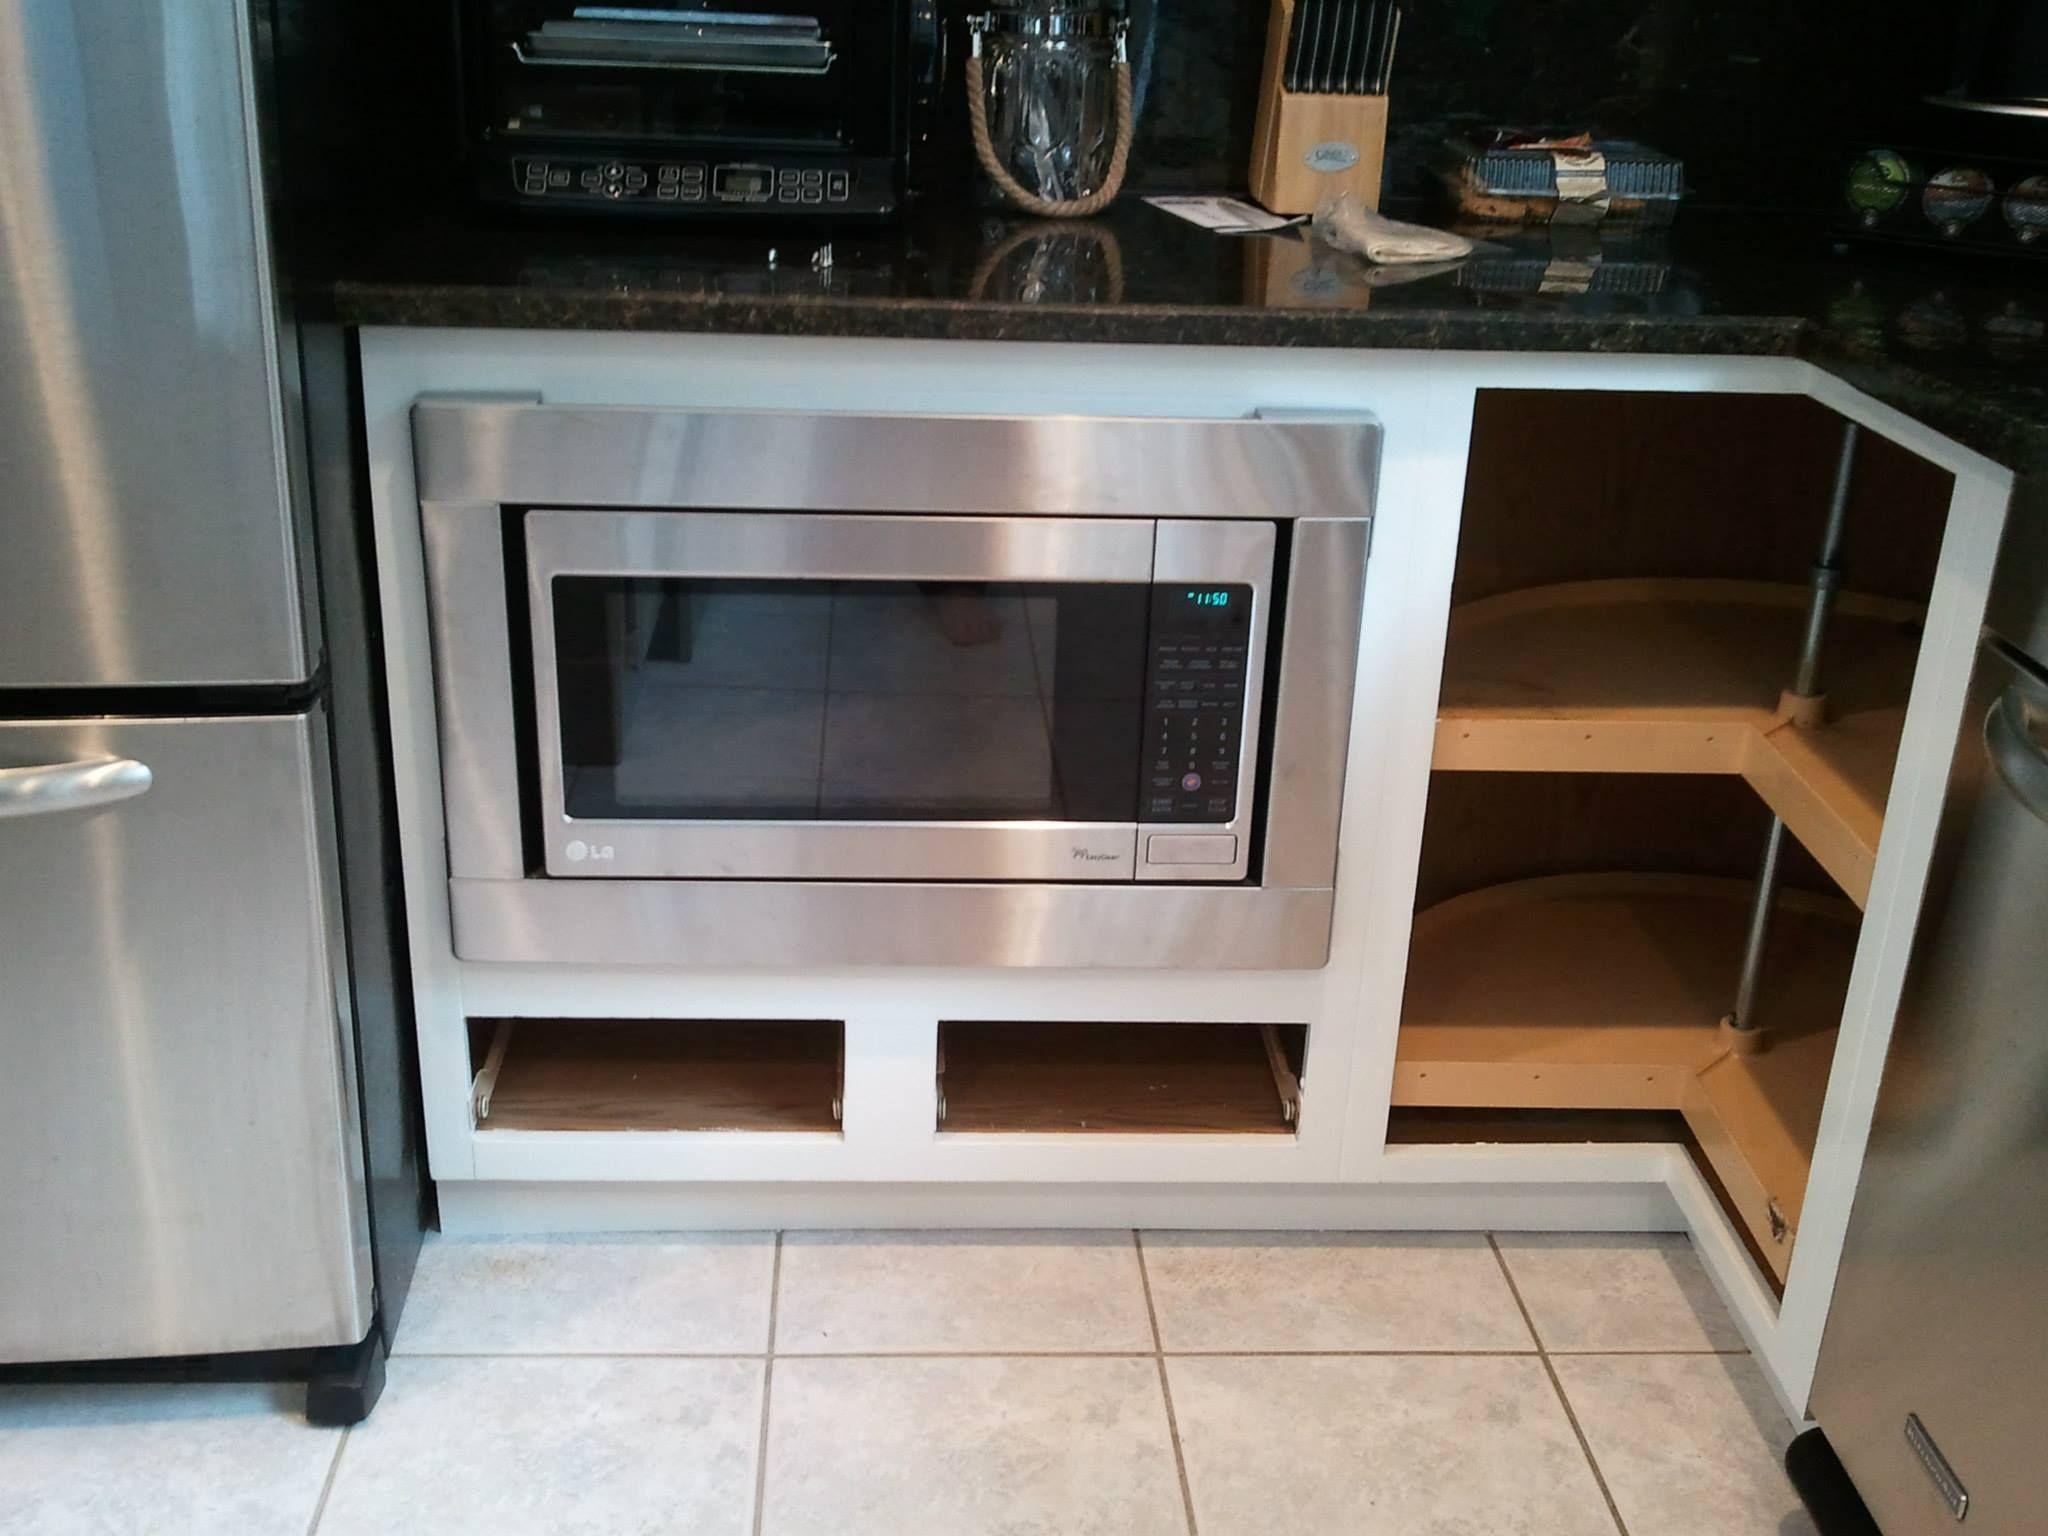 Convert Countertop Microwave To Built In : Pin by Elizabeth VanHorn on House Pinterest